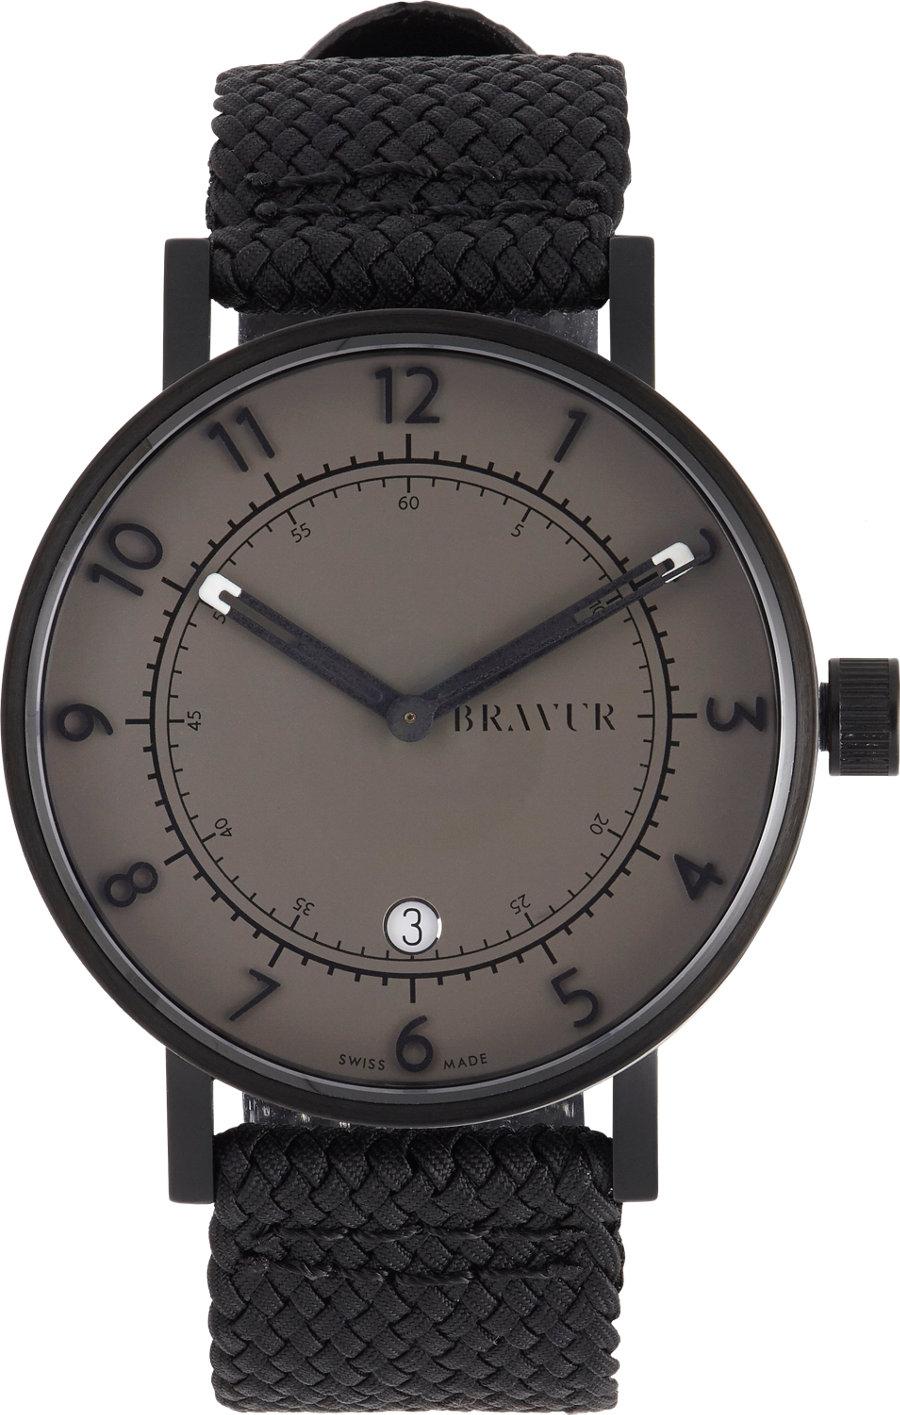 lyst bravur round face watch 41mm in black for men. Black Bedroom Furniture Sets. Home Design Ideas